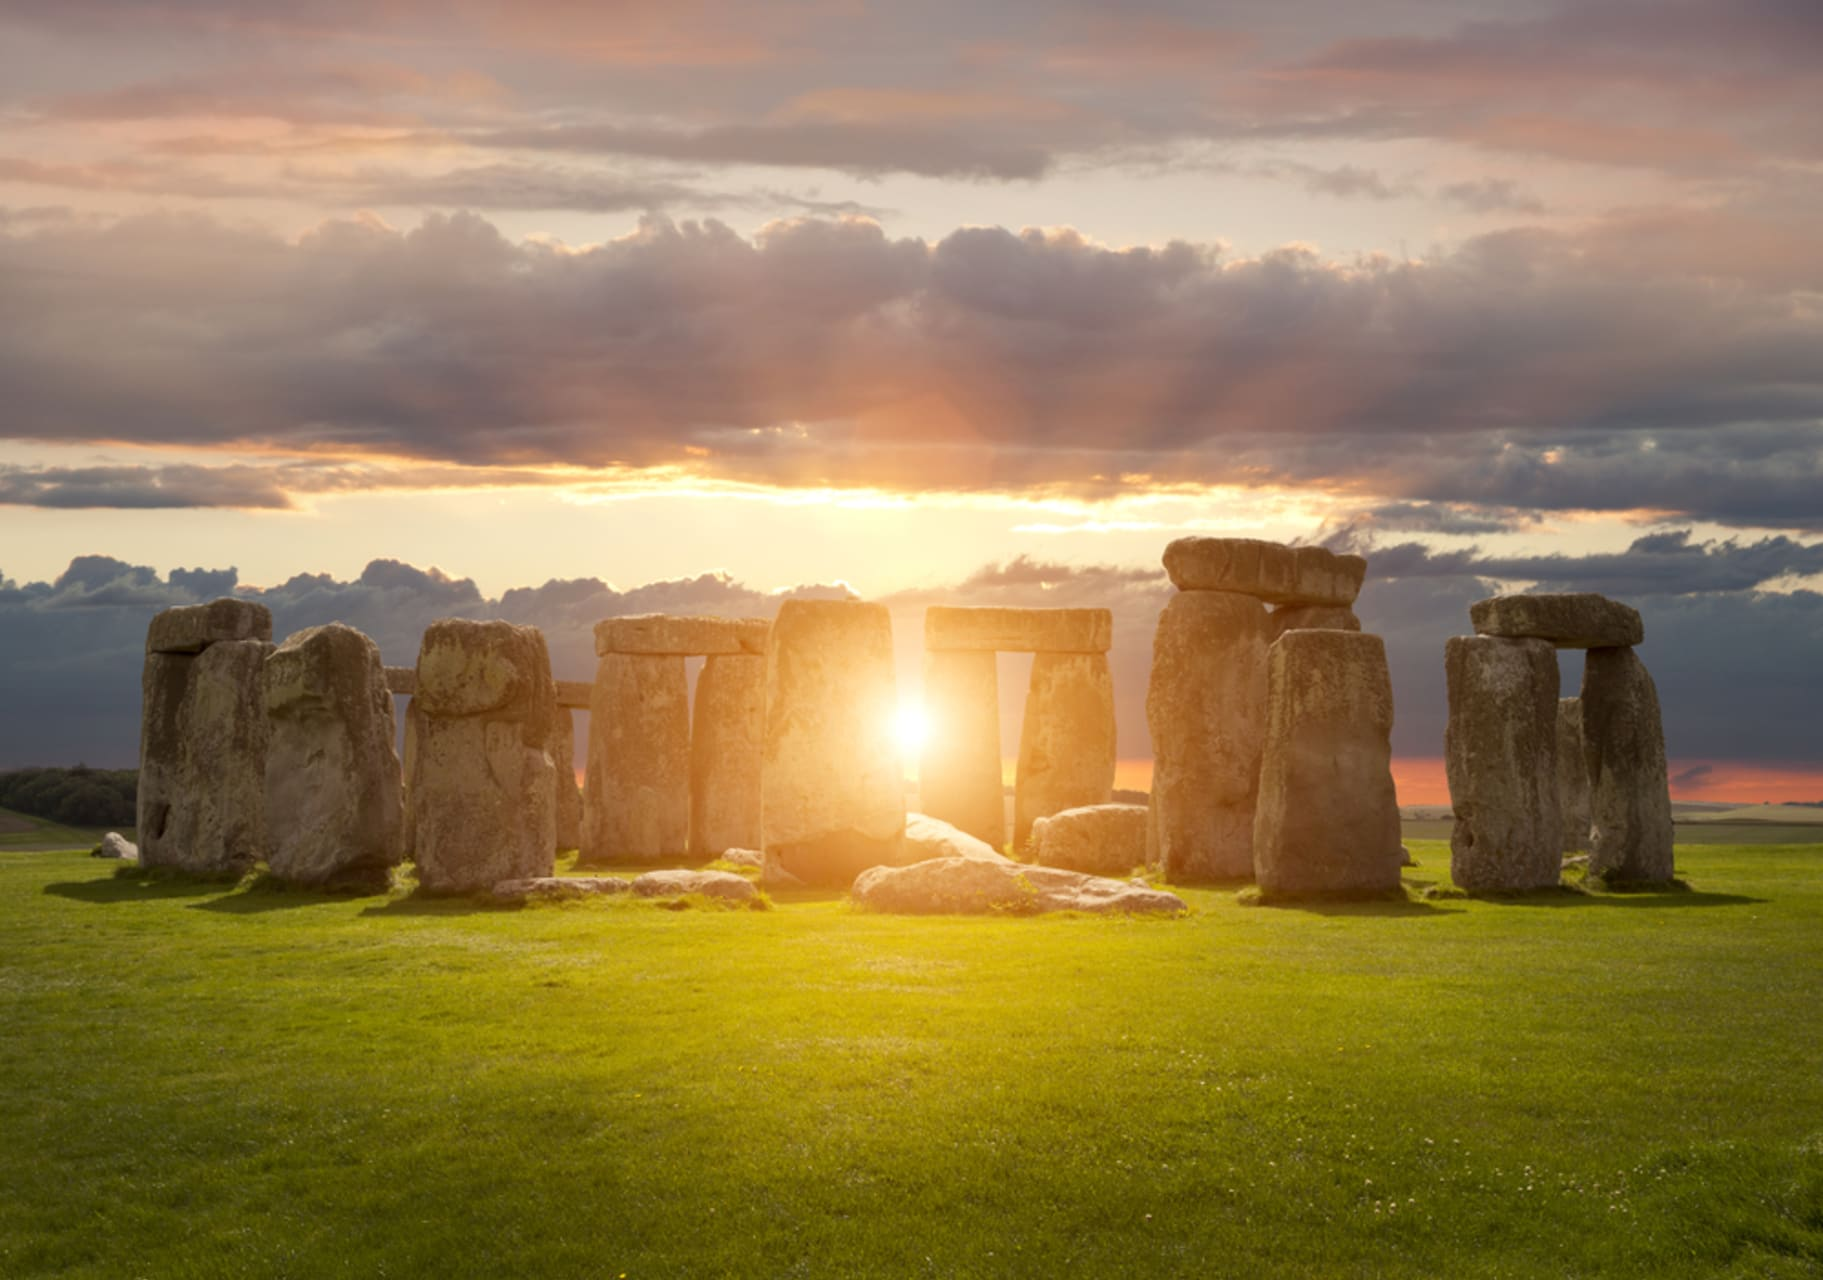 Wiltshire - Stonehenge special tour ahead of midsummer solstice